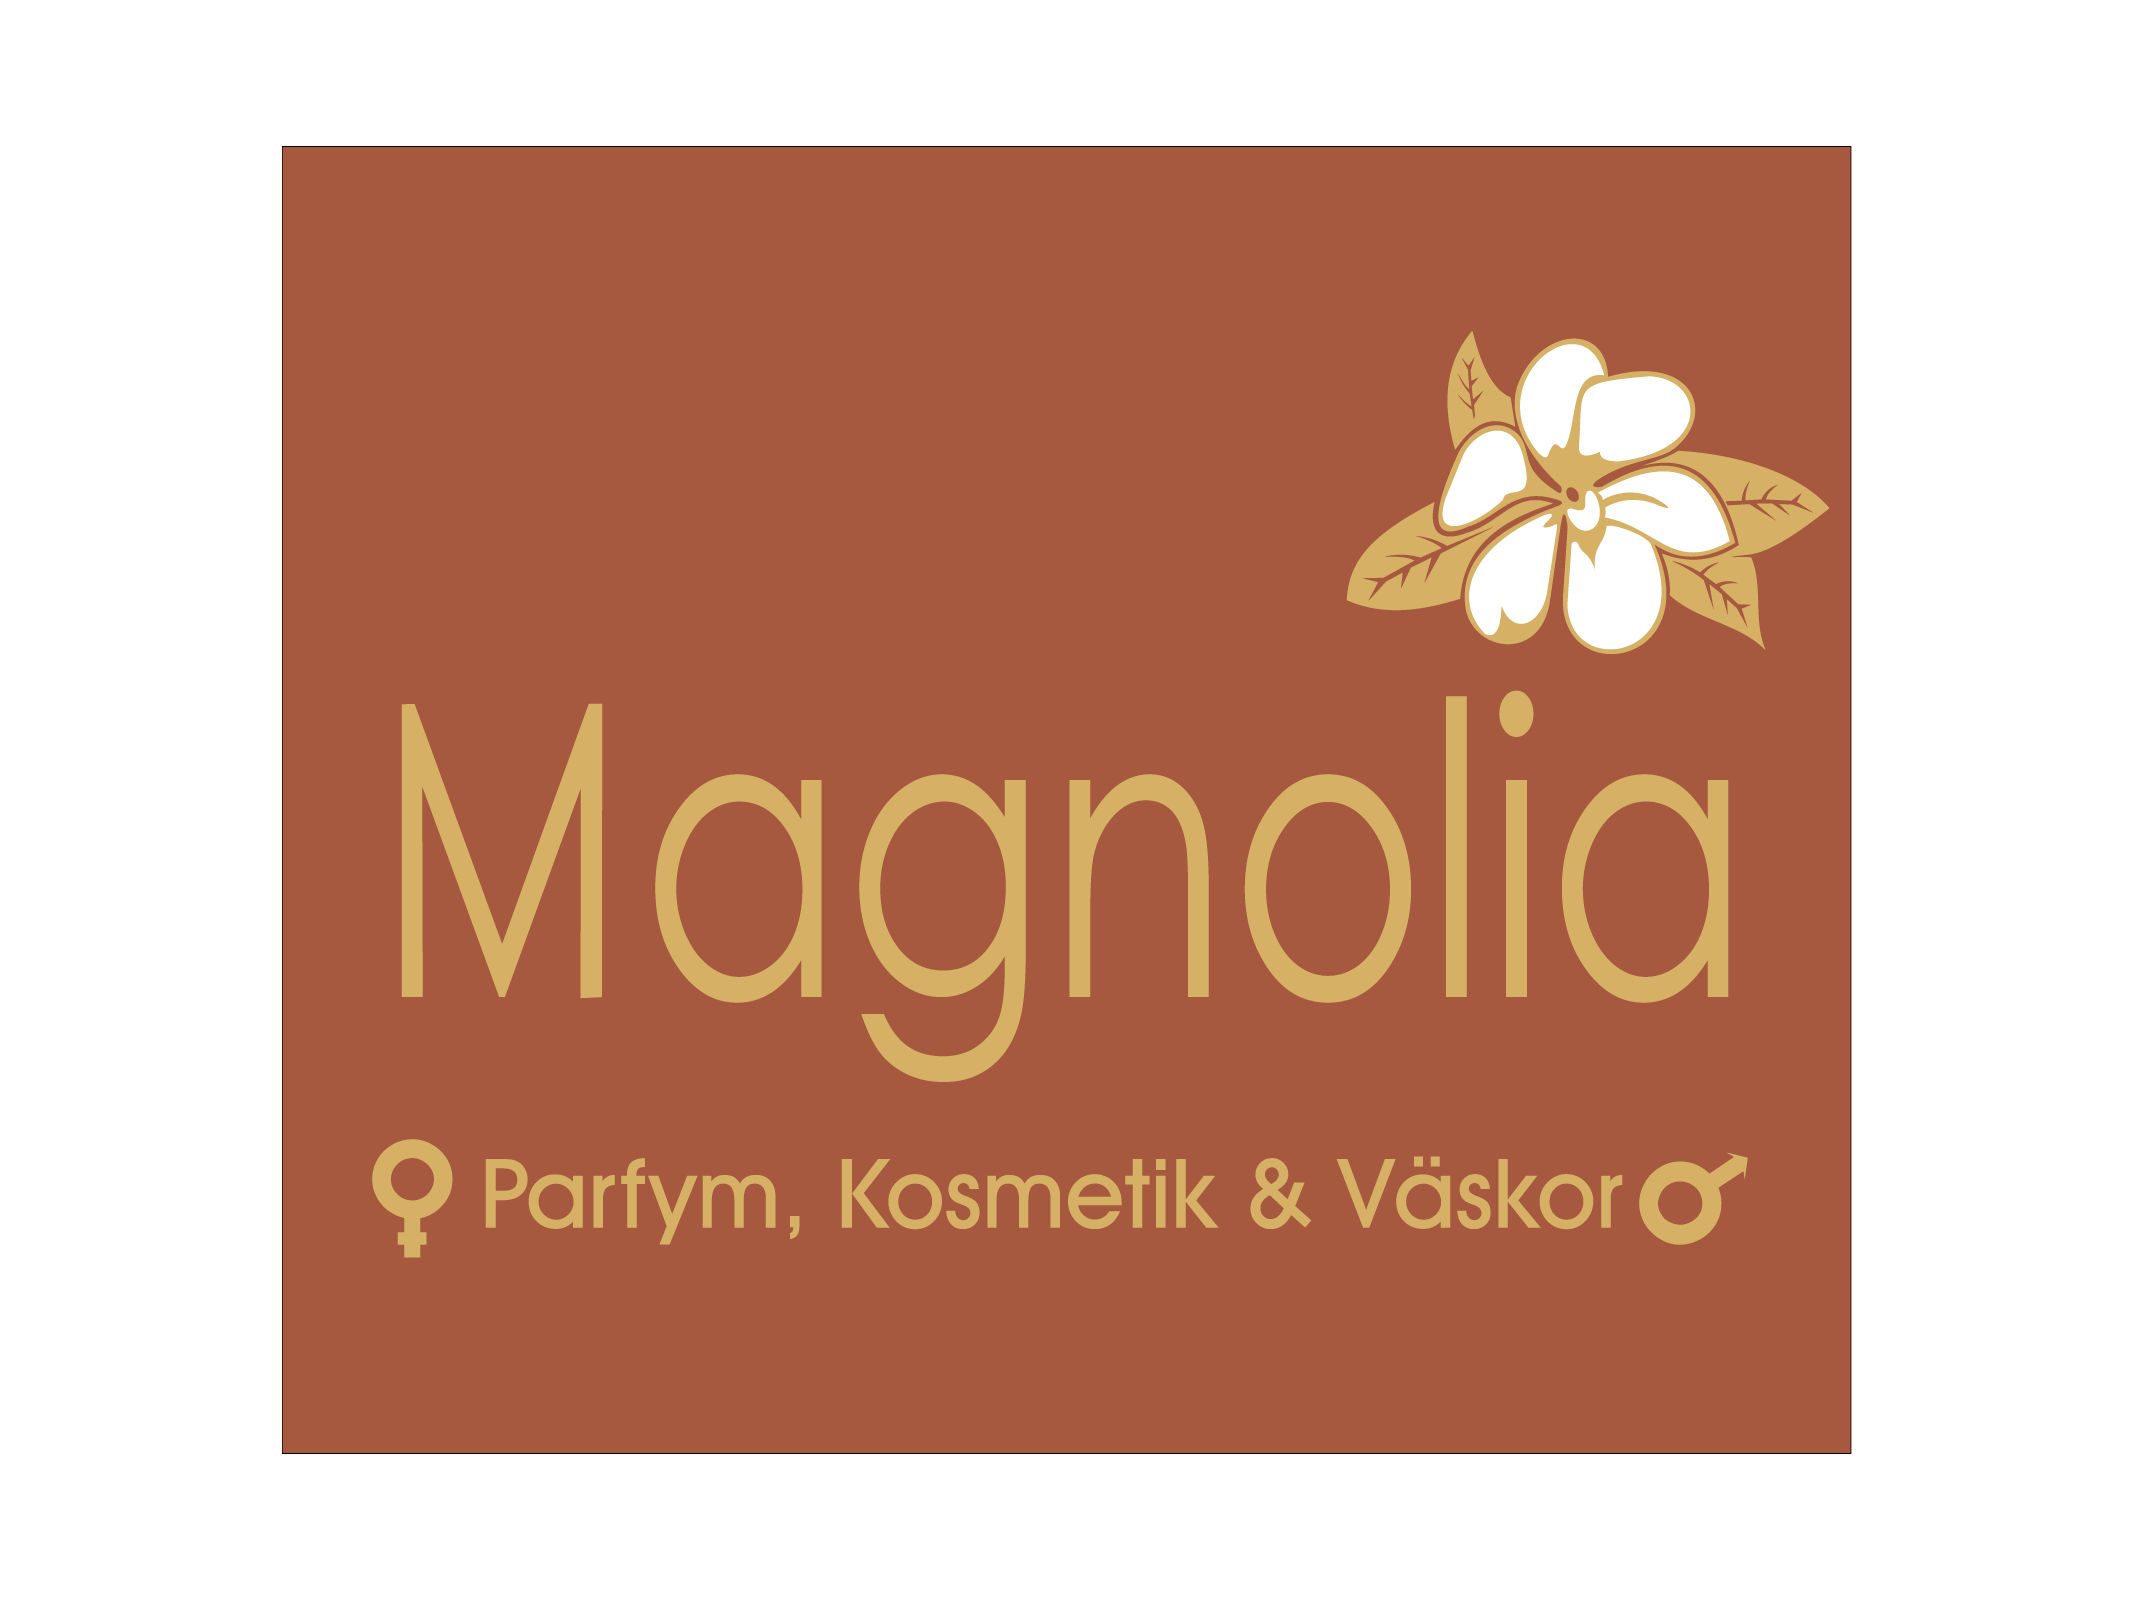 Magnolia parfymbutik